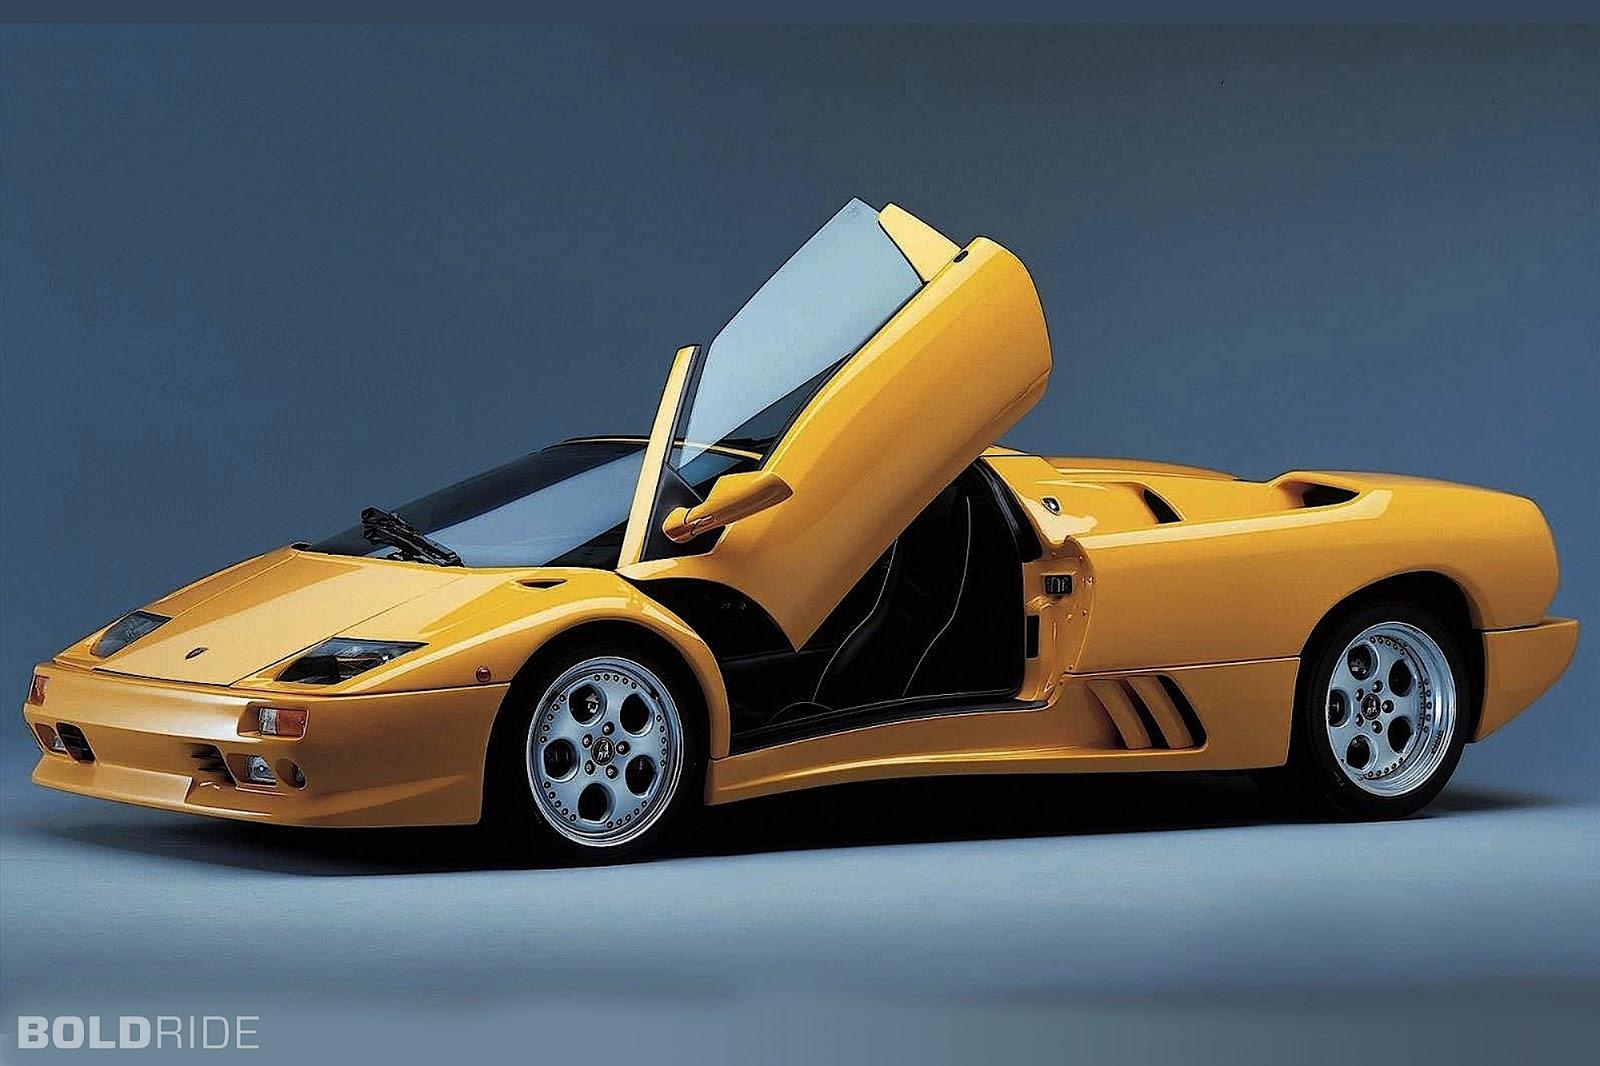 Luxury Lamborghini Cars: Lamborghini Diablo Roadster